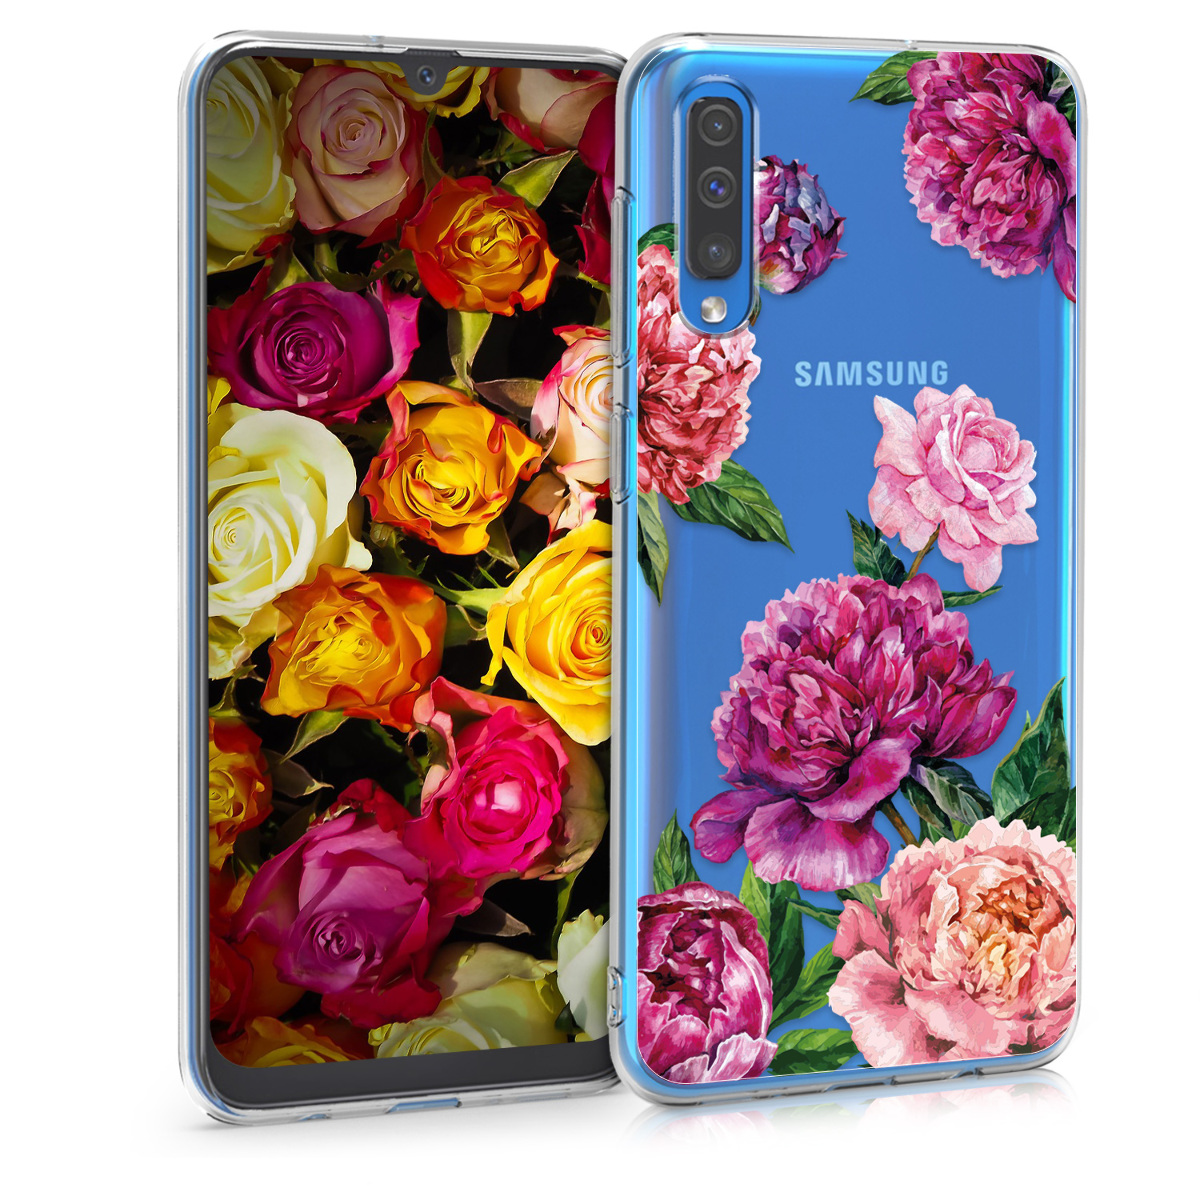 KW Θήκη Σιλικόνης Samsung Galaxy A50 - Violet / Light Pink / Transparent (48060.12)